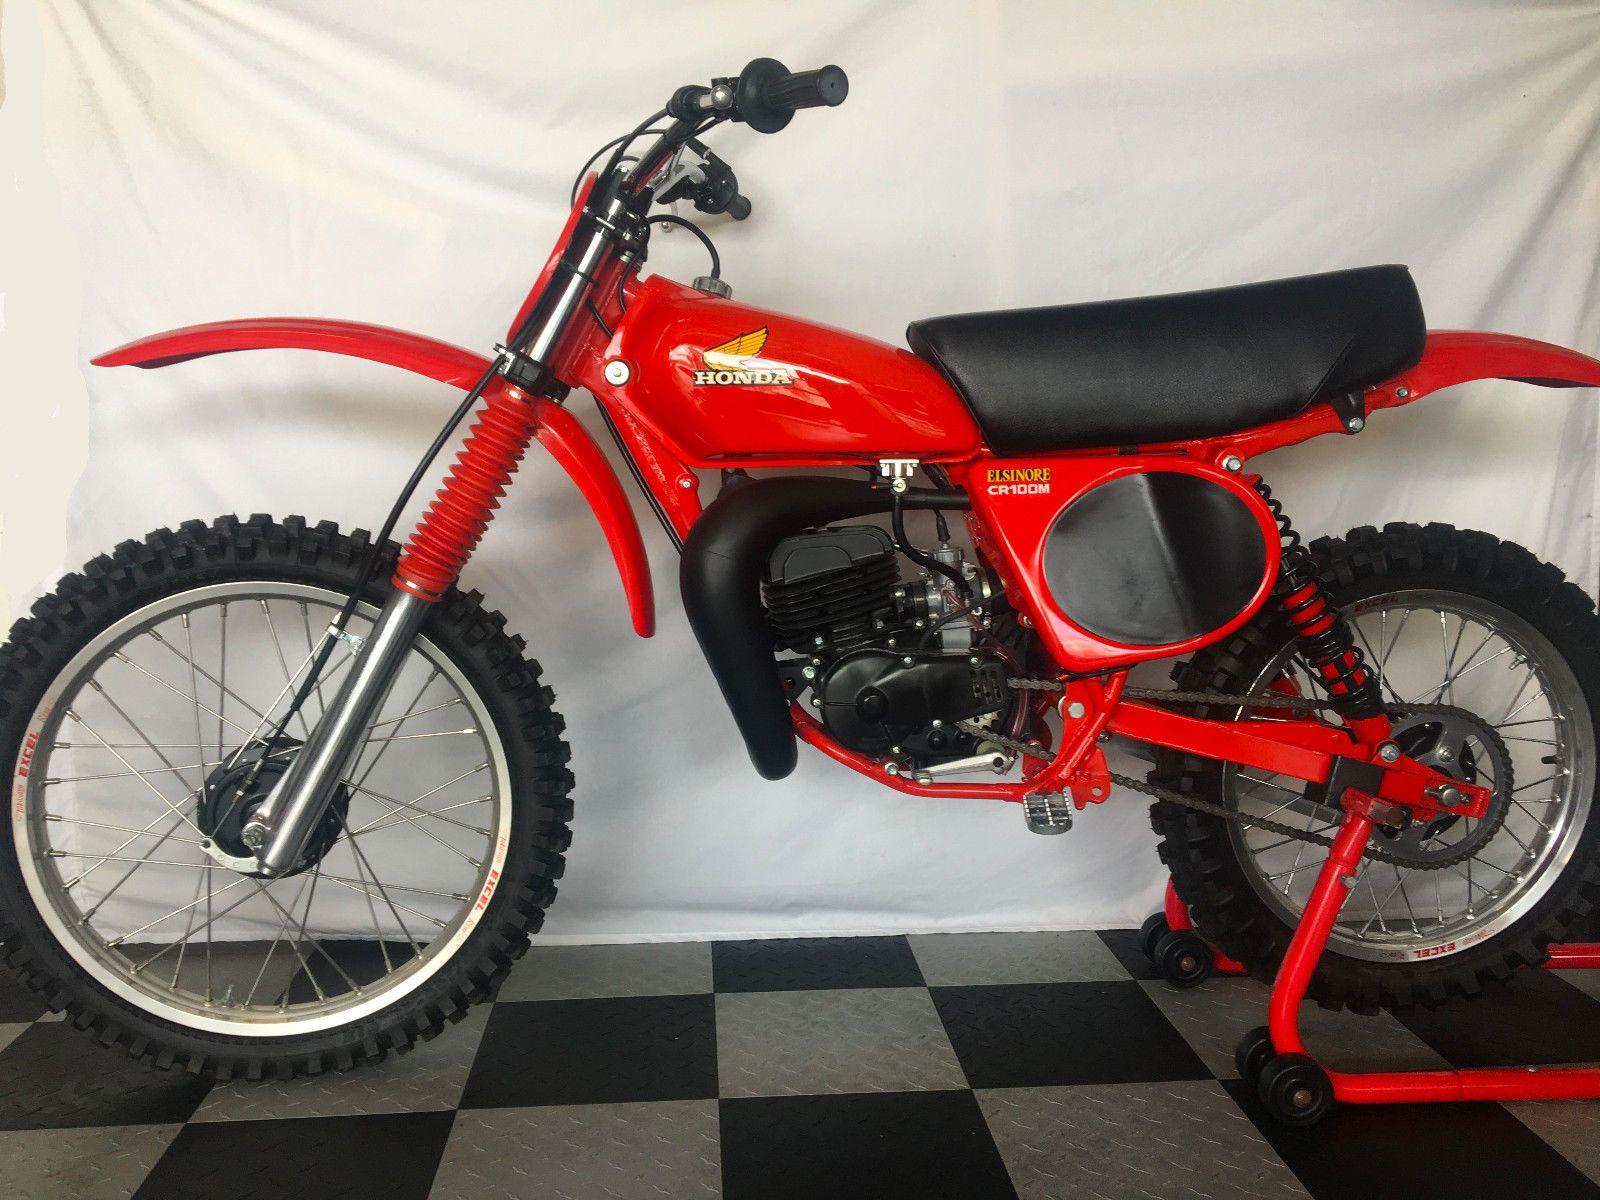 eBay: 1975 Honda CR 1975 1977 Honda CR125 - CR100 Sleeve Down Restored  Vintage Motocross AHRMA #motorcycles #biker